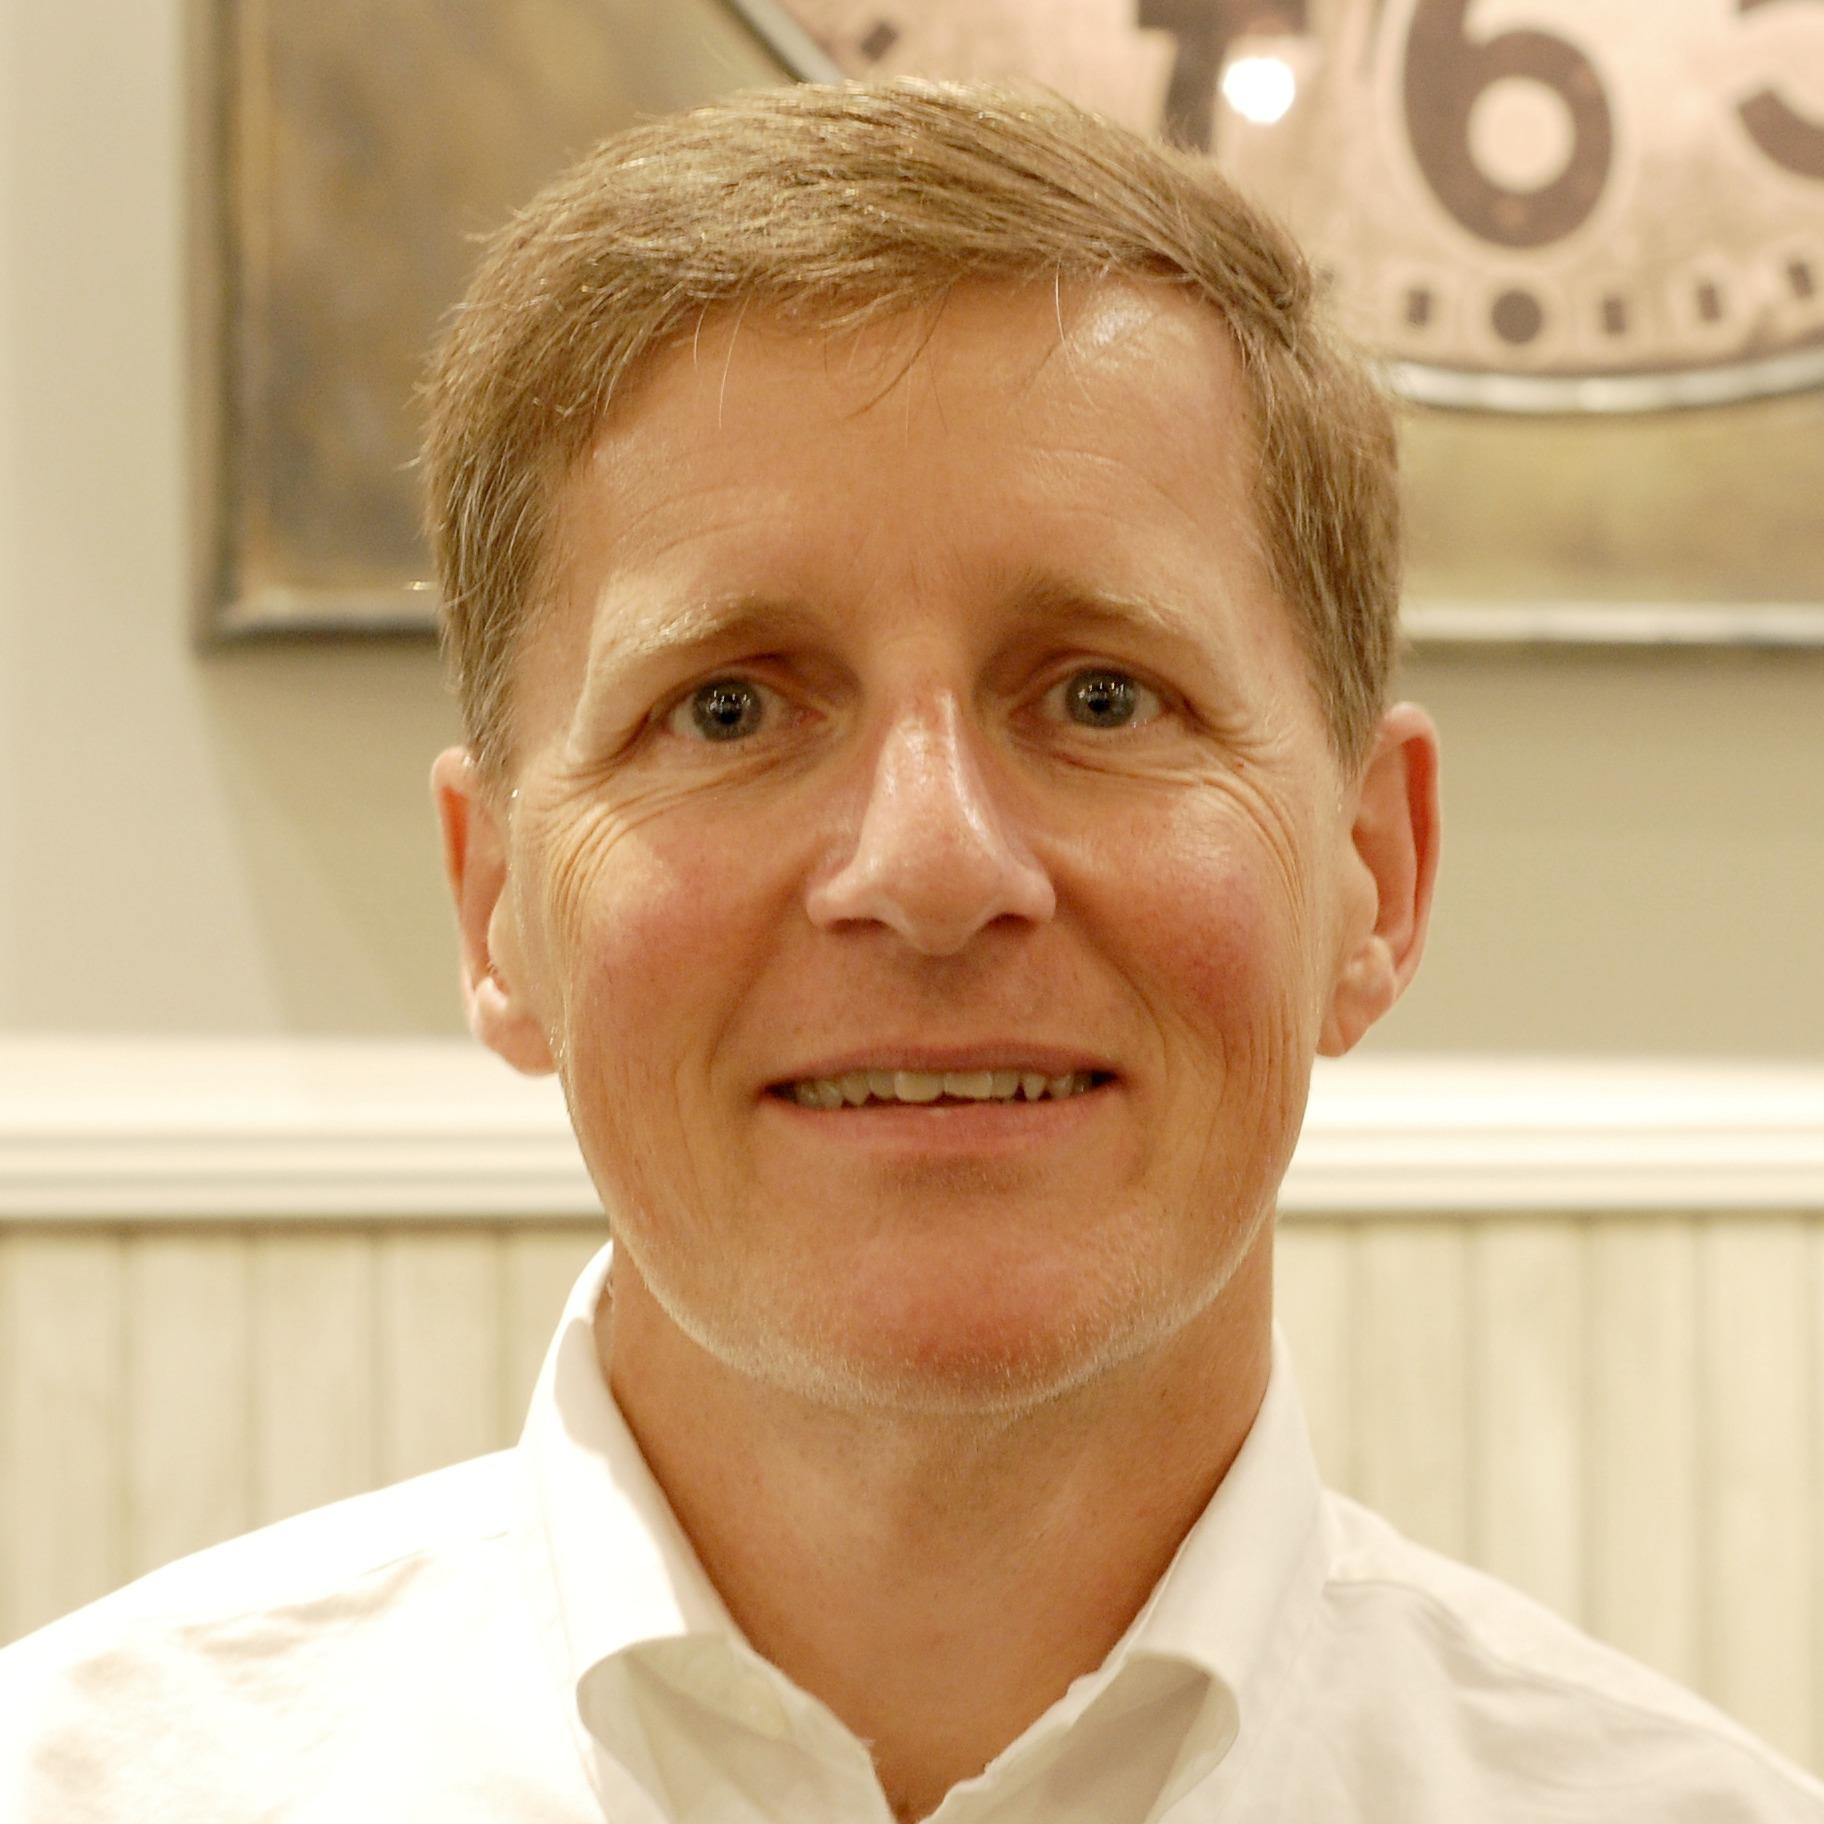 Nathan Chilcutt